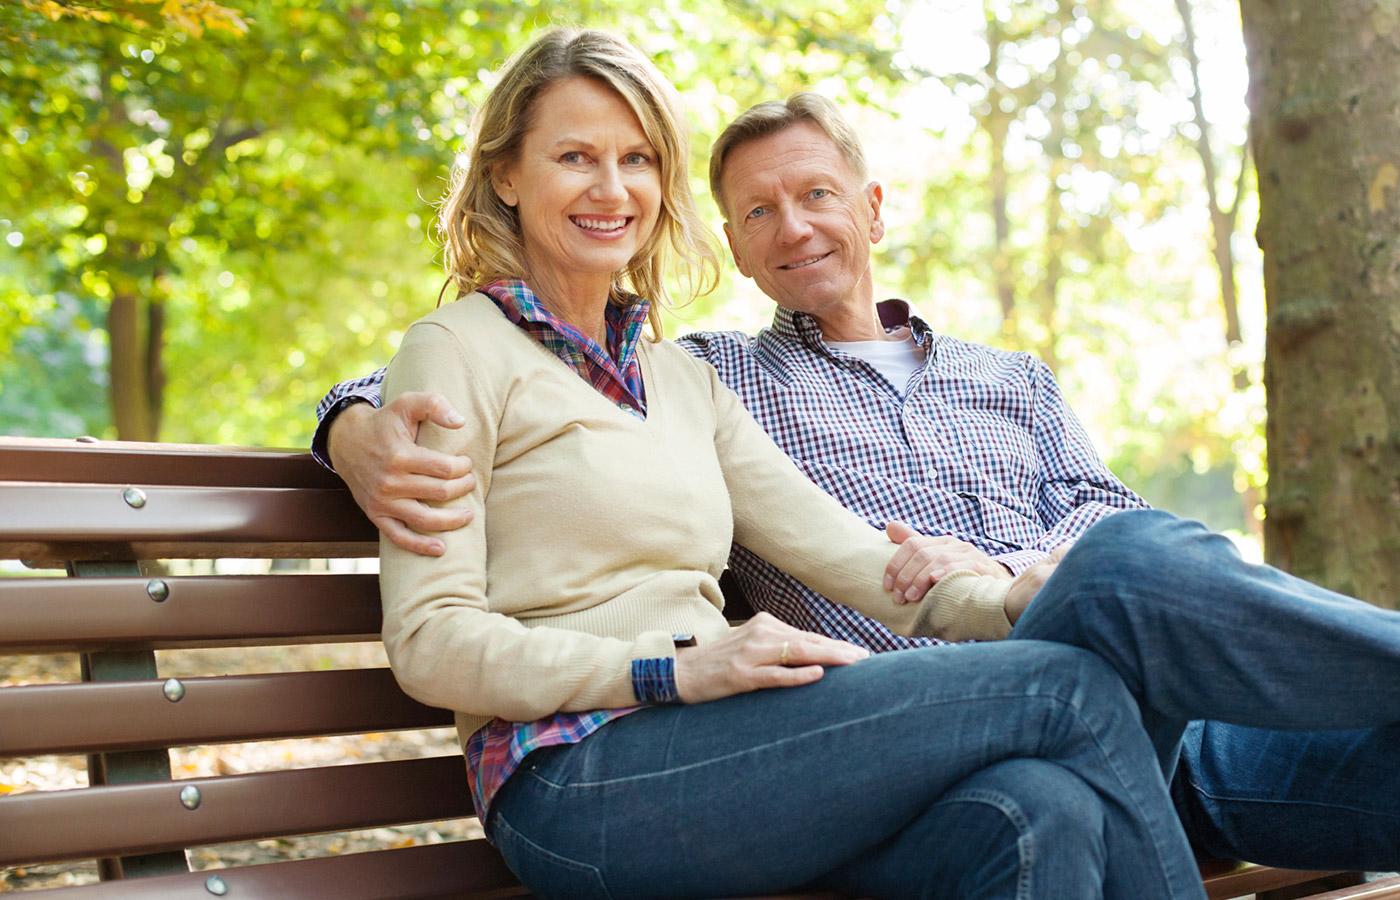 image-middle-age-couple.jpg